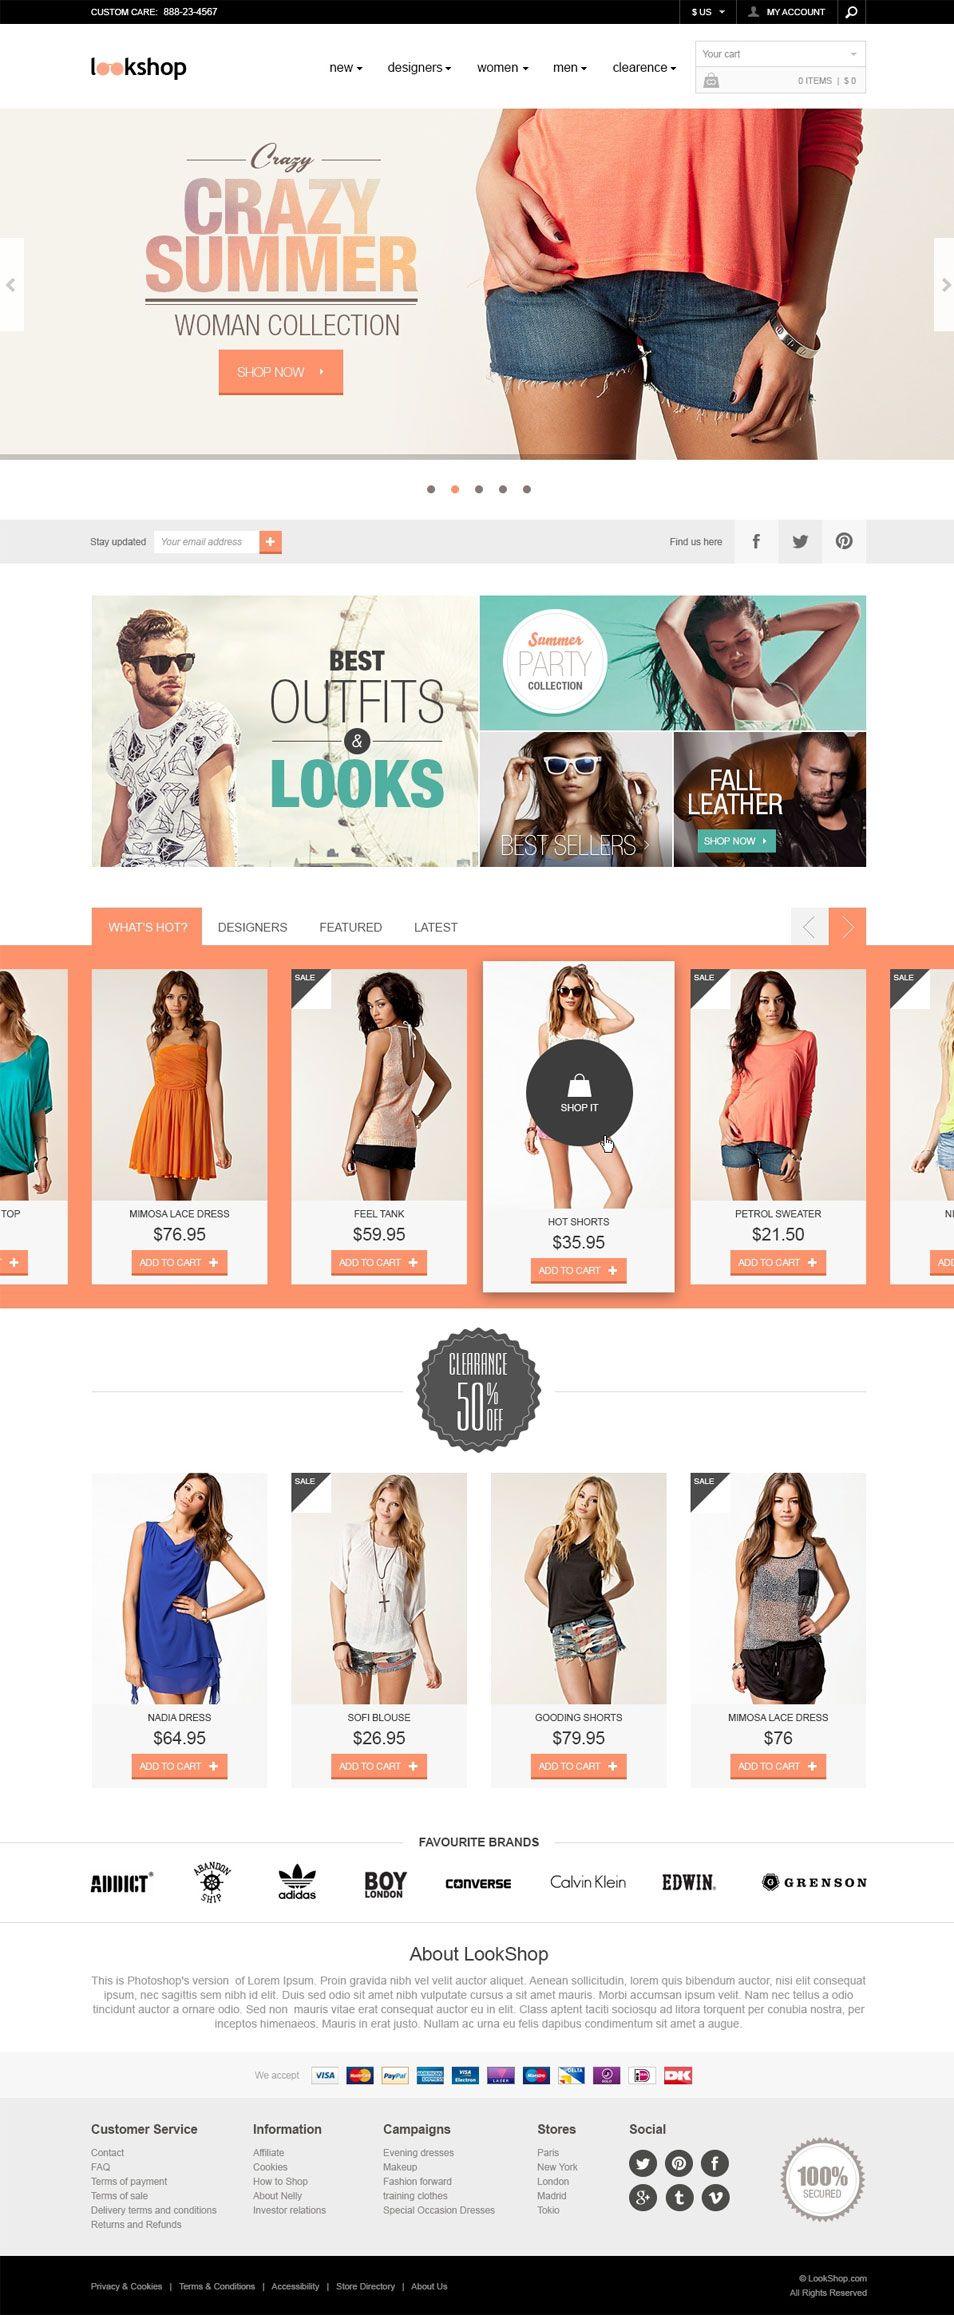 Free webdesign template Nice e merce design layout webdesign